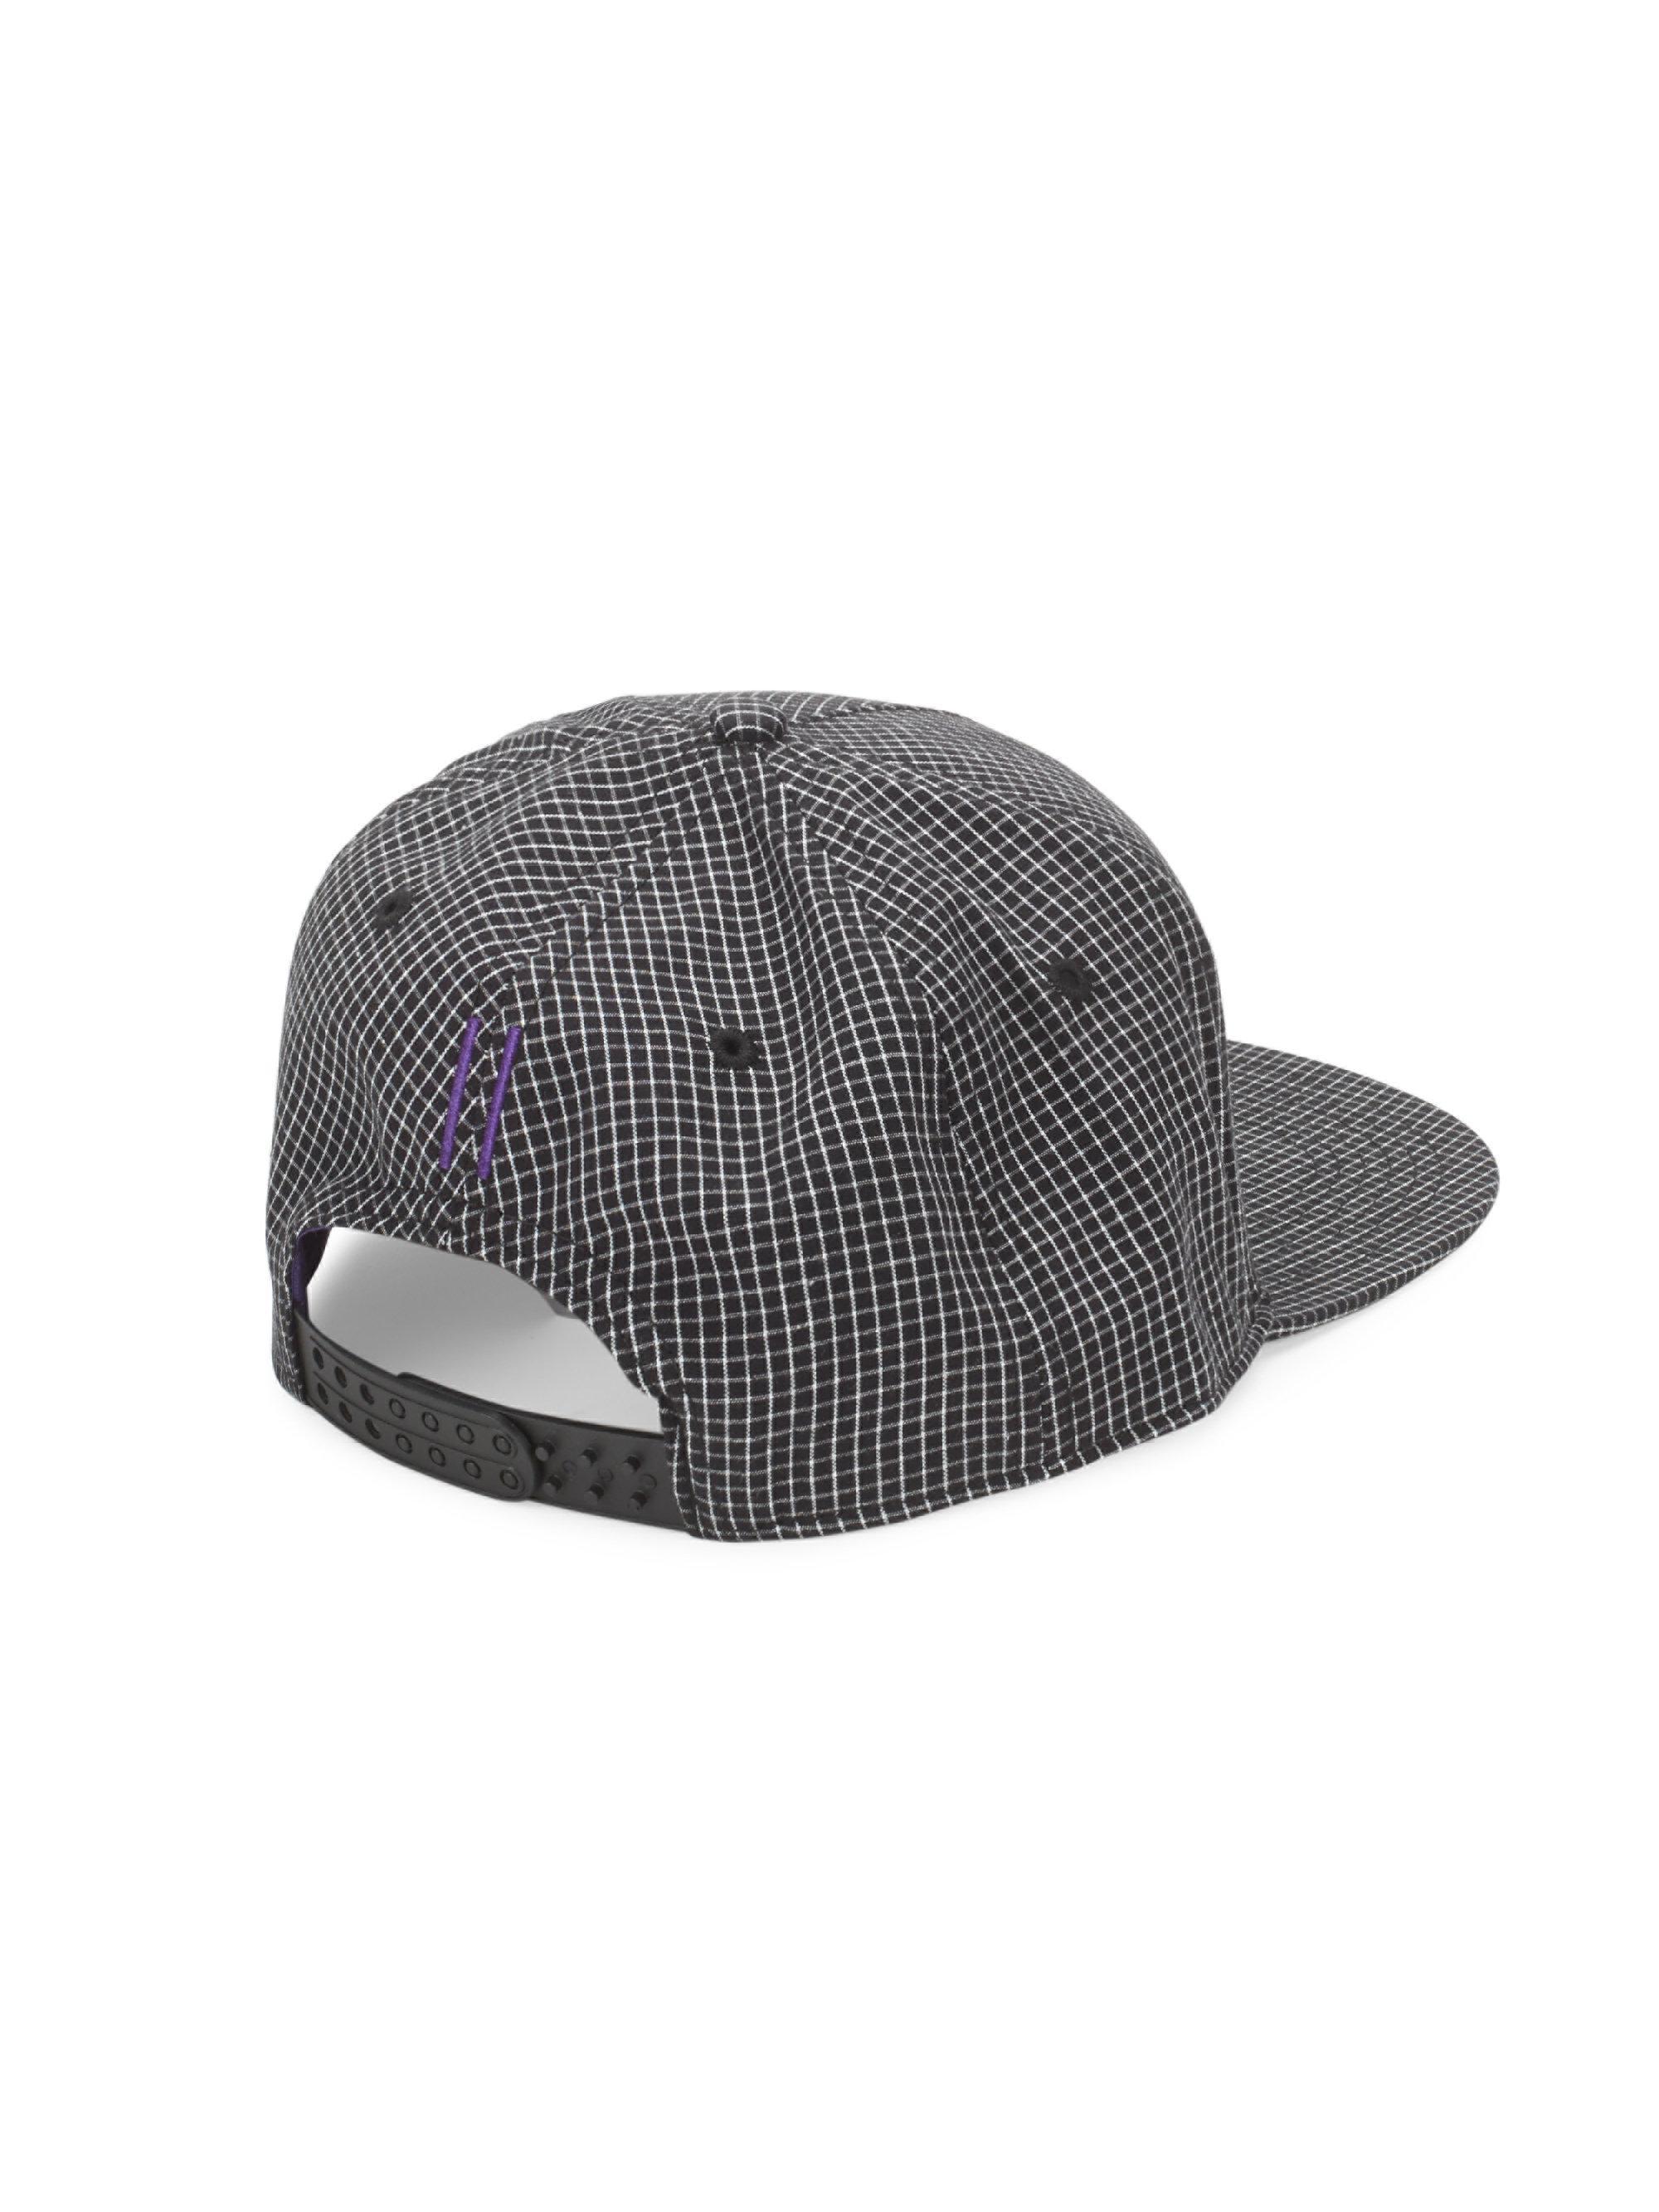 Lyst - Gents Chairman Check-print Baseball Cap in Black for Men 93c5508568f